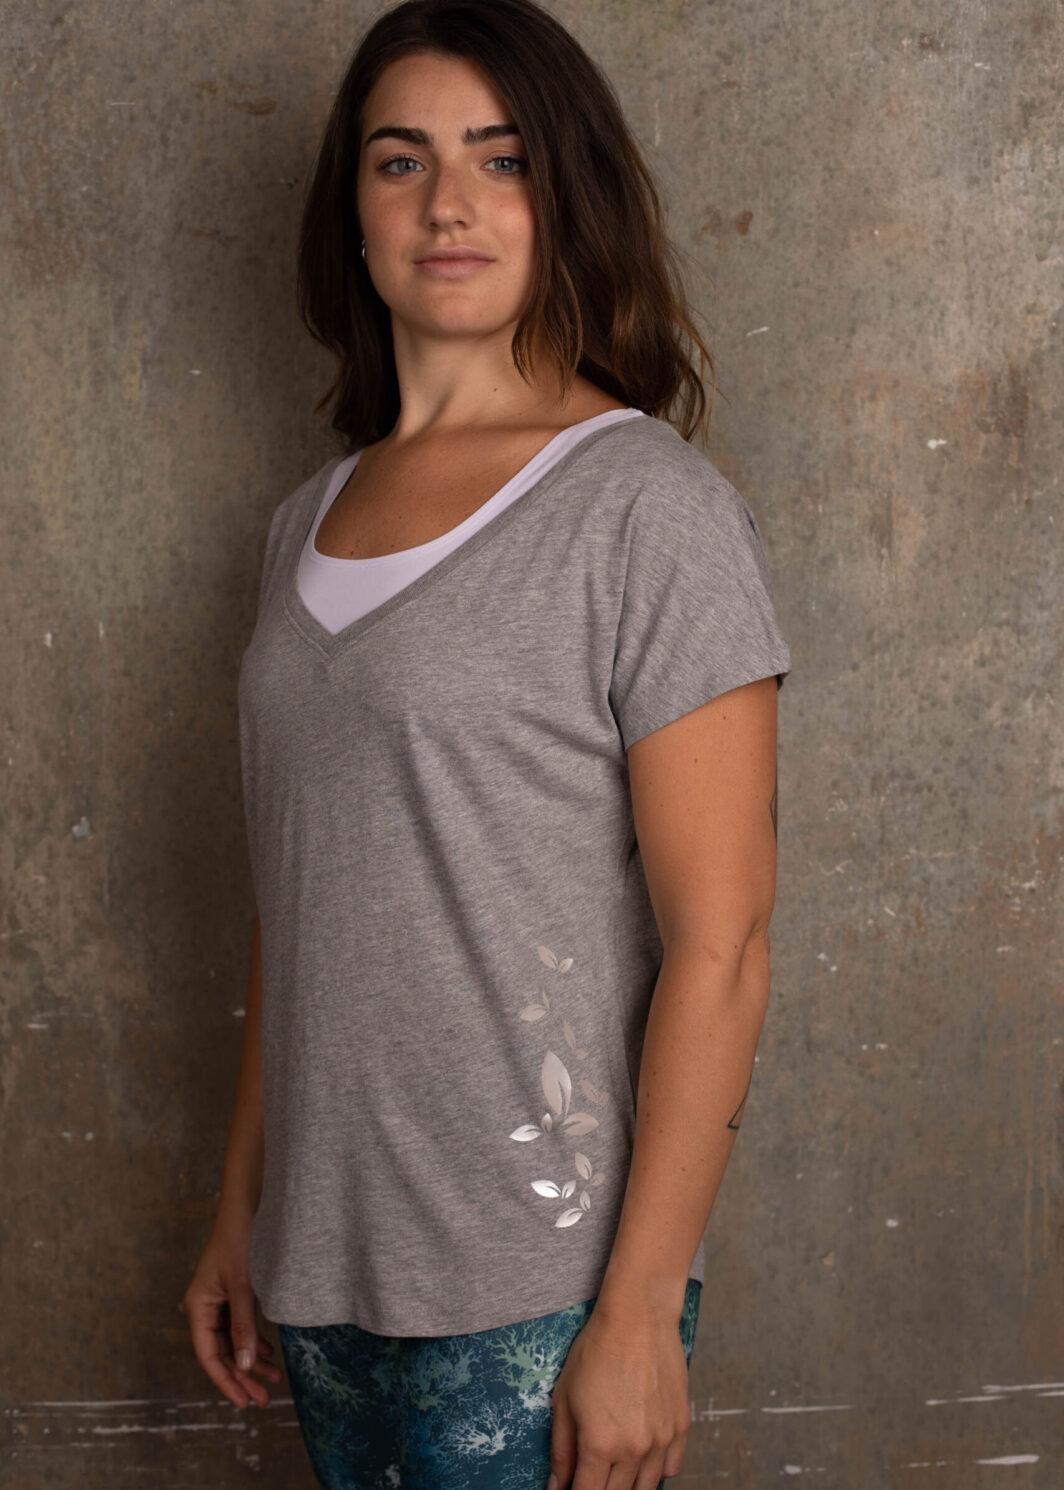 YOGETTE | T-shirt sportiva DALLAS - Yoga - Pilates